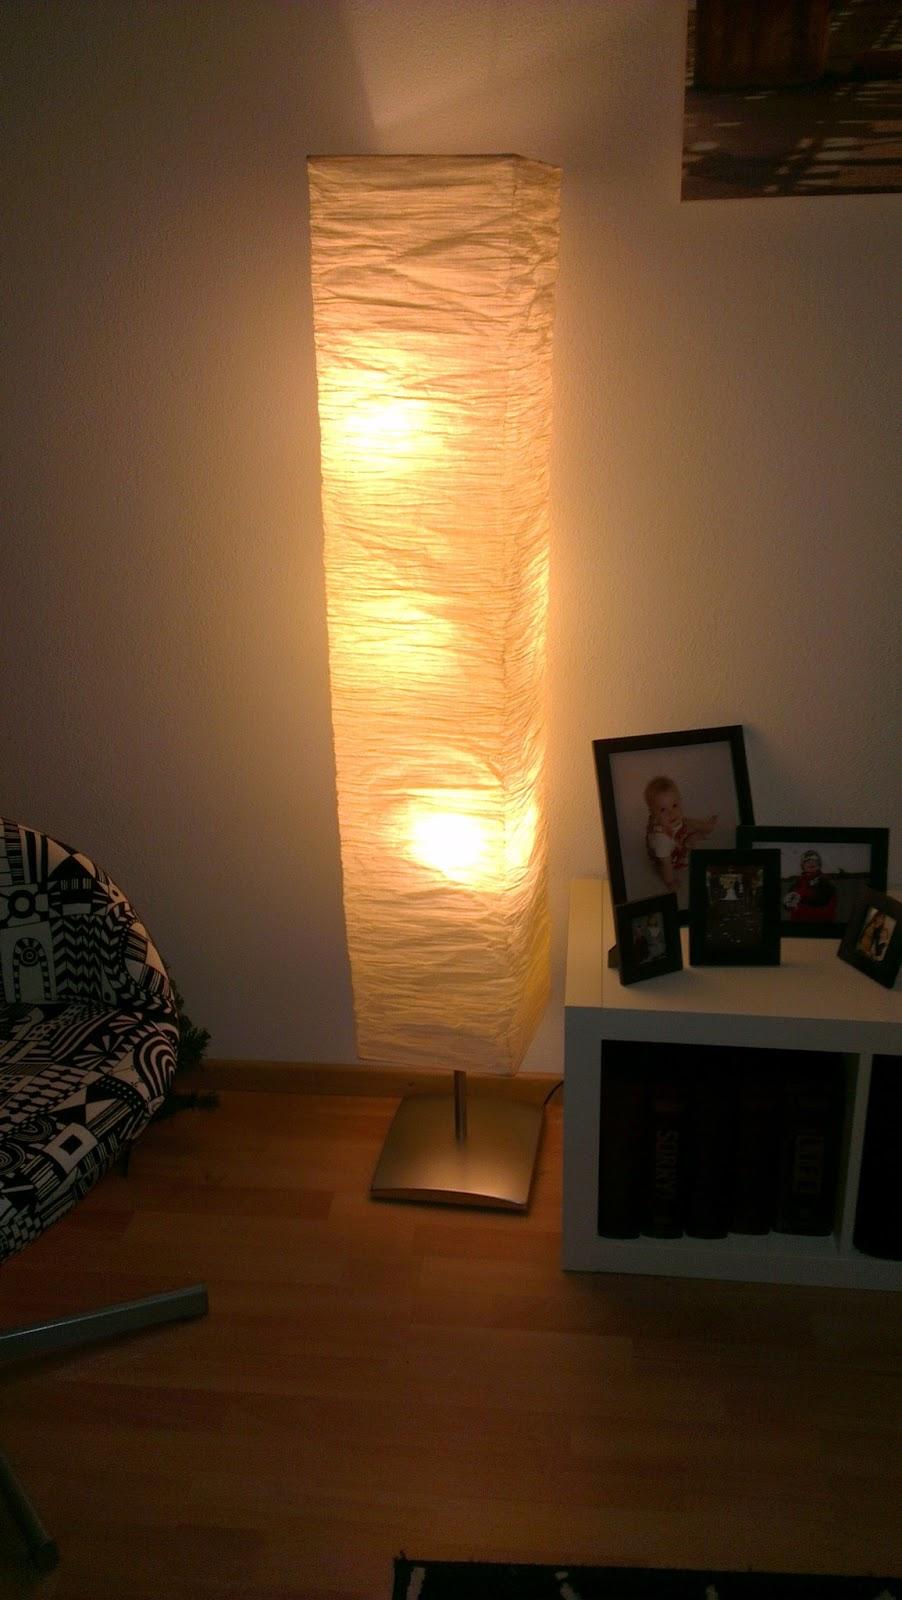 Ikea Värde Eckschrank Neupreis ~ Ace the Adventure IKEA Vrijdag Orgel Vreten Staand Lamp Floor Lamp